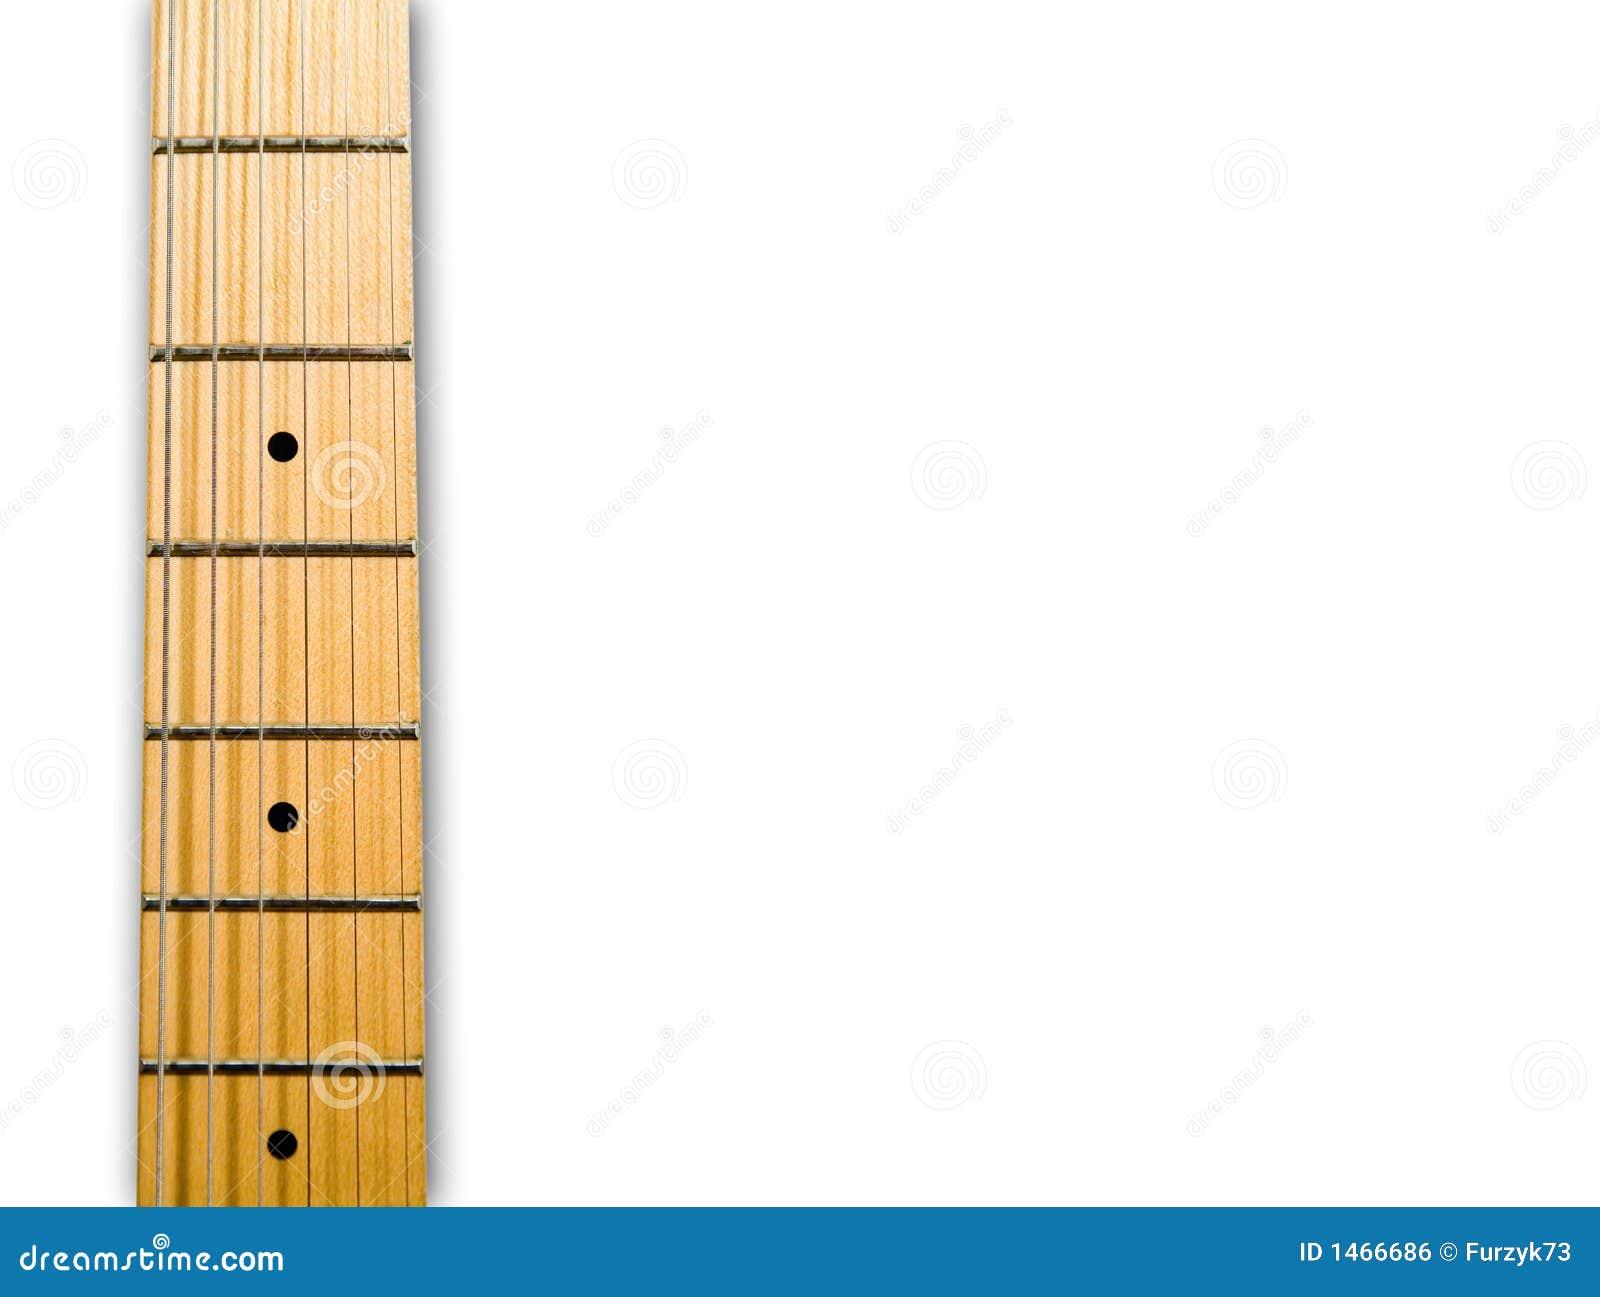 Guitar s neck